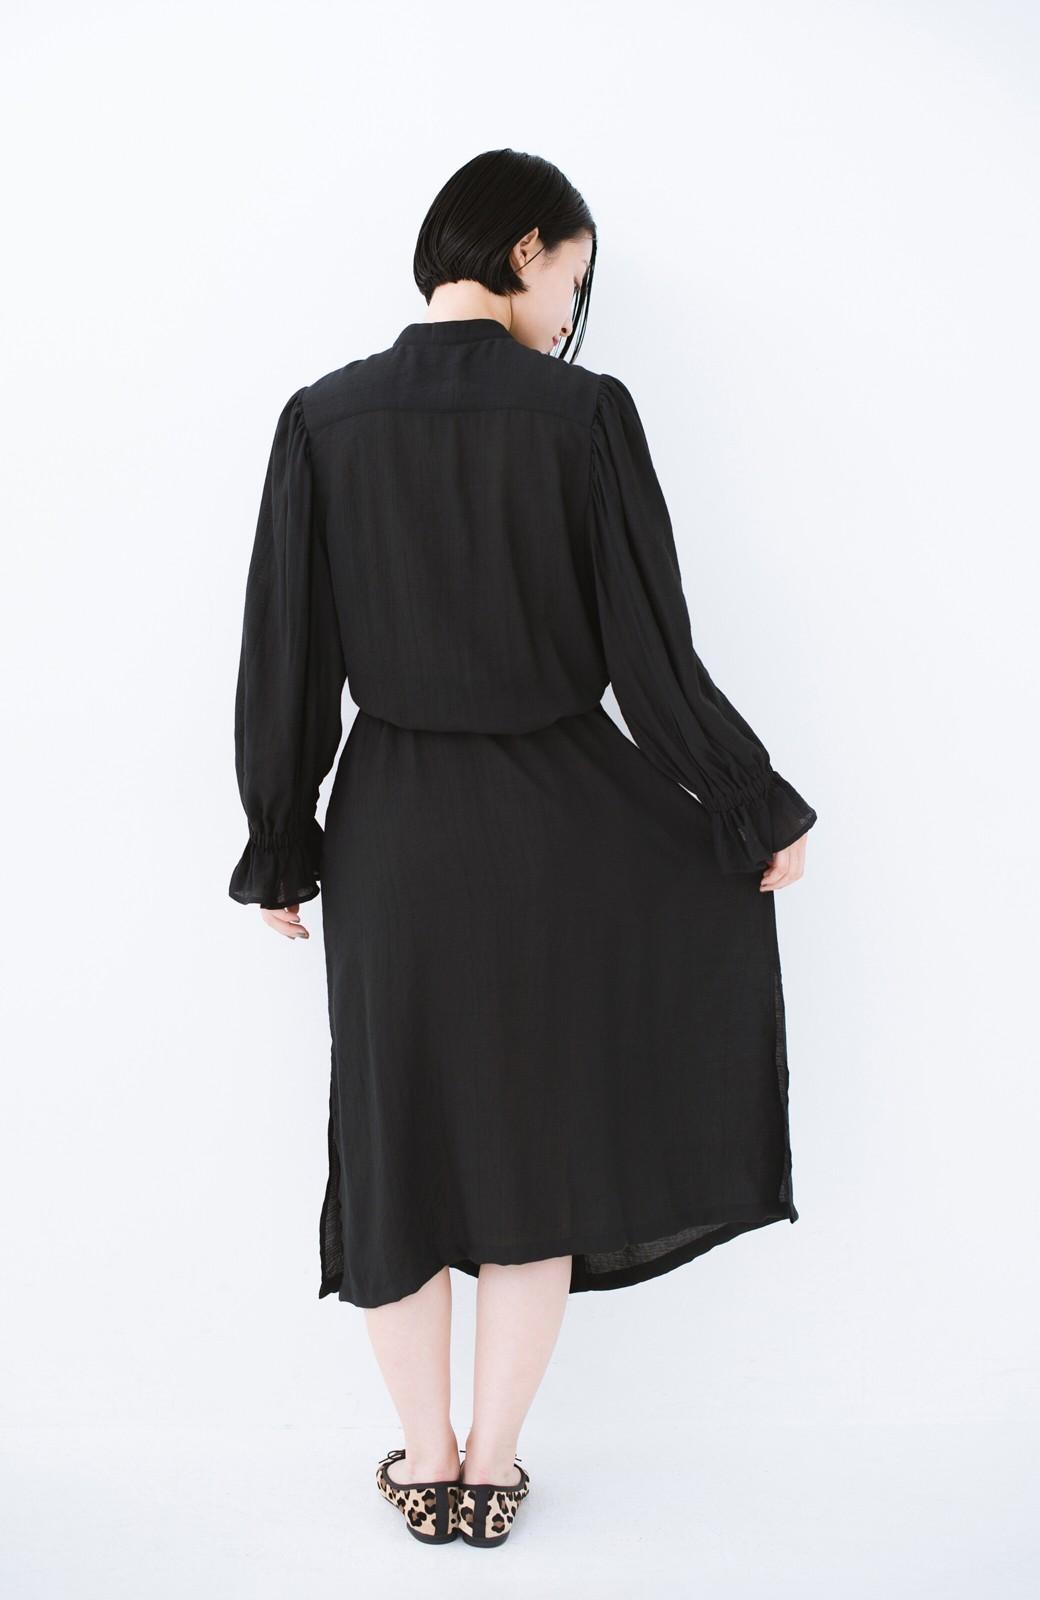 haco! 太ってもばれず 羽織っても便利なウエストリボンワンピース <ブラック>の商品写真14